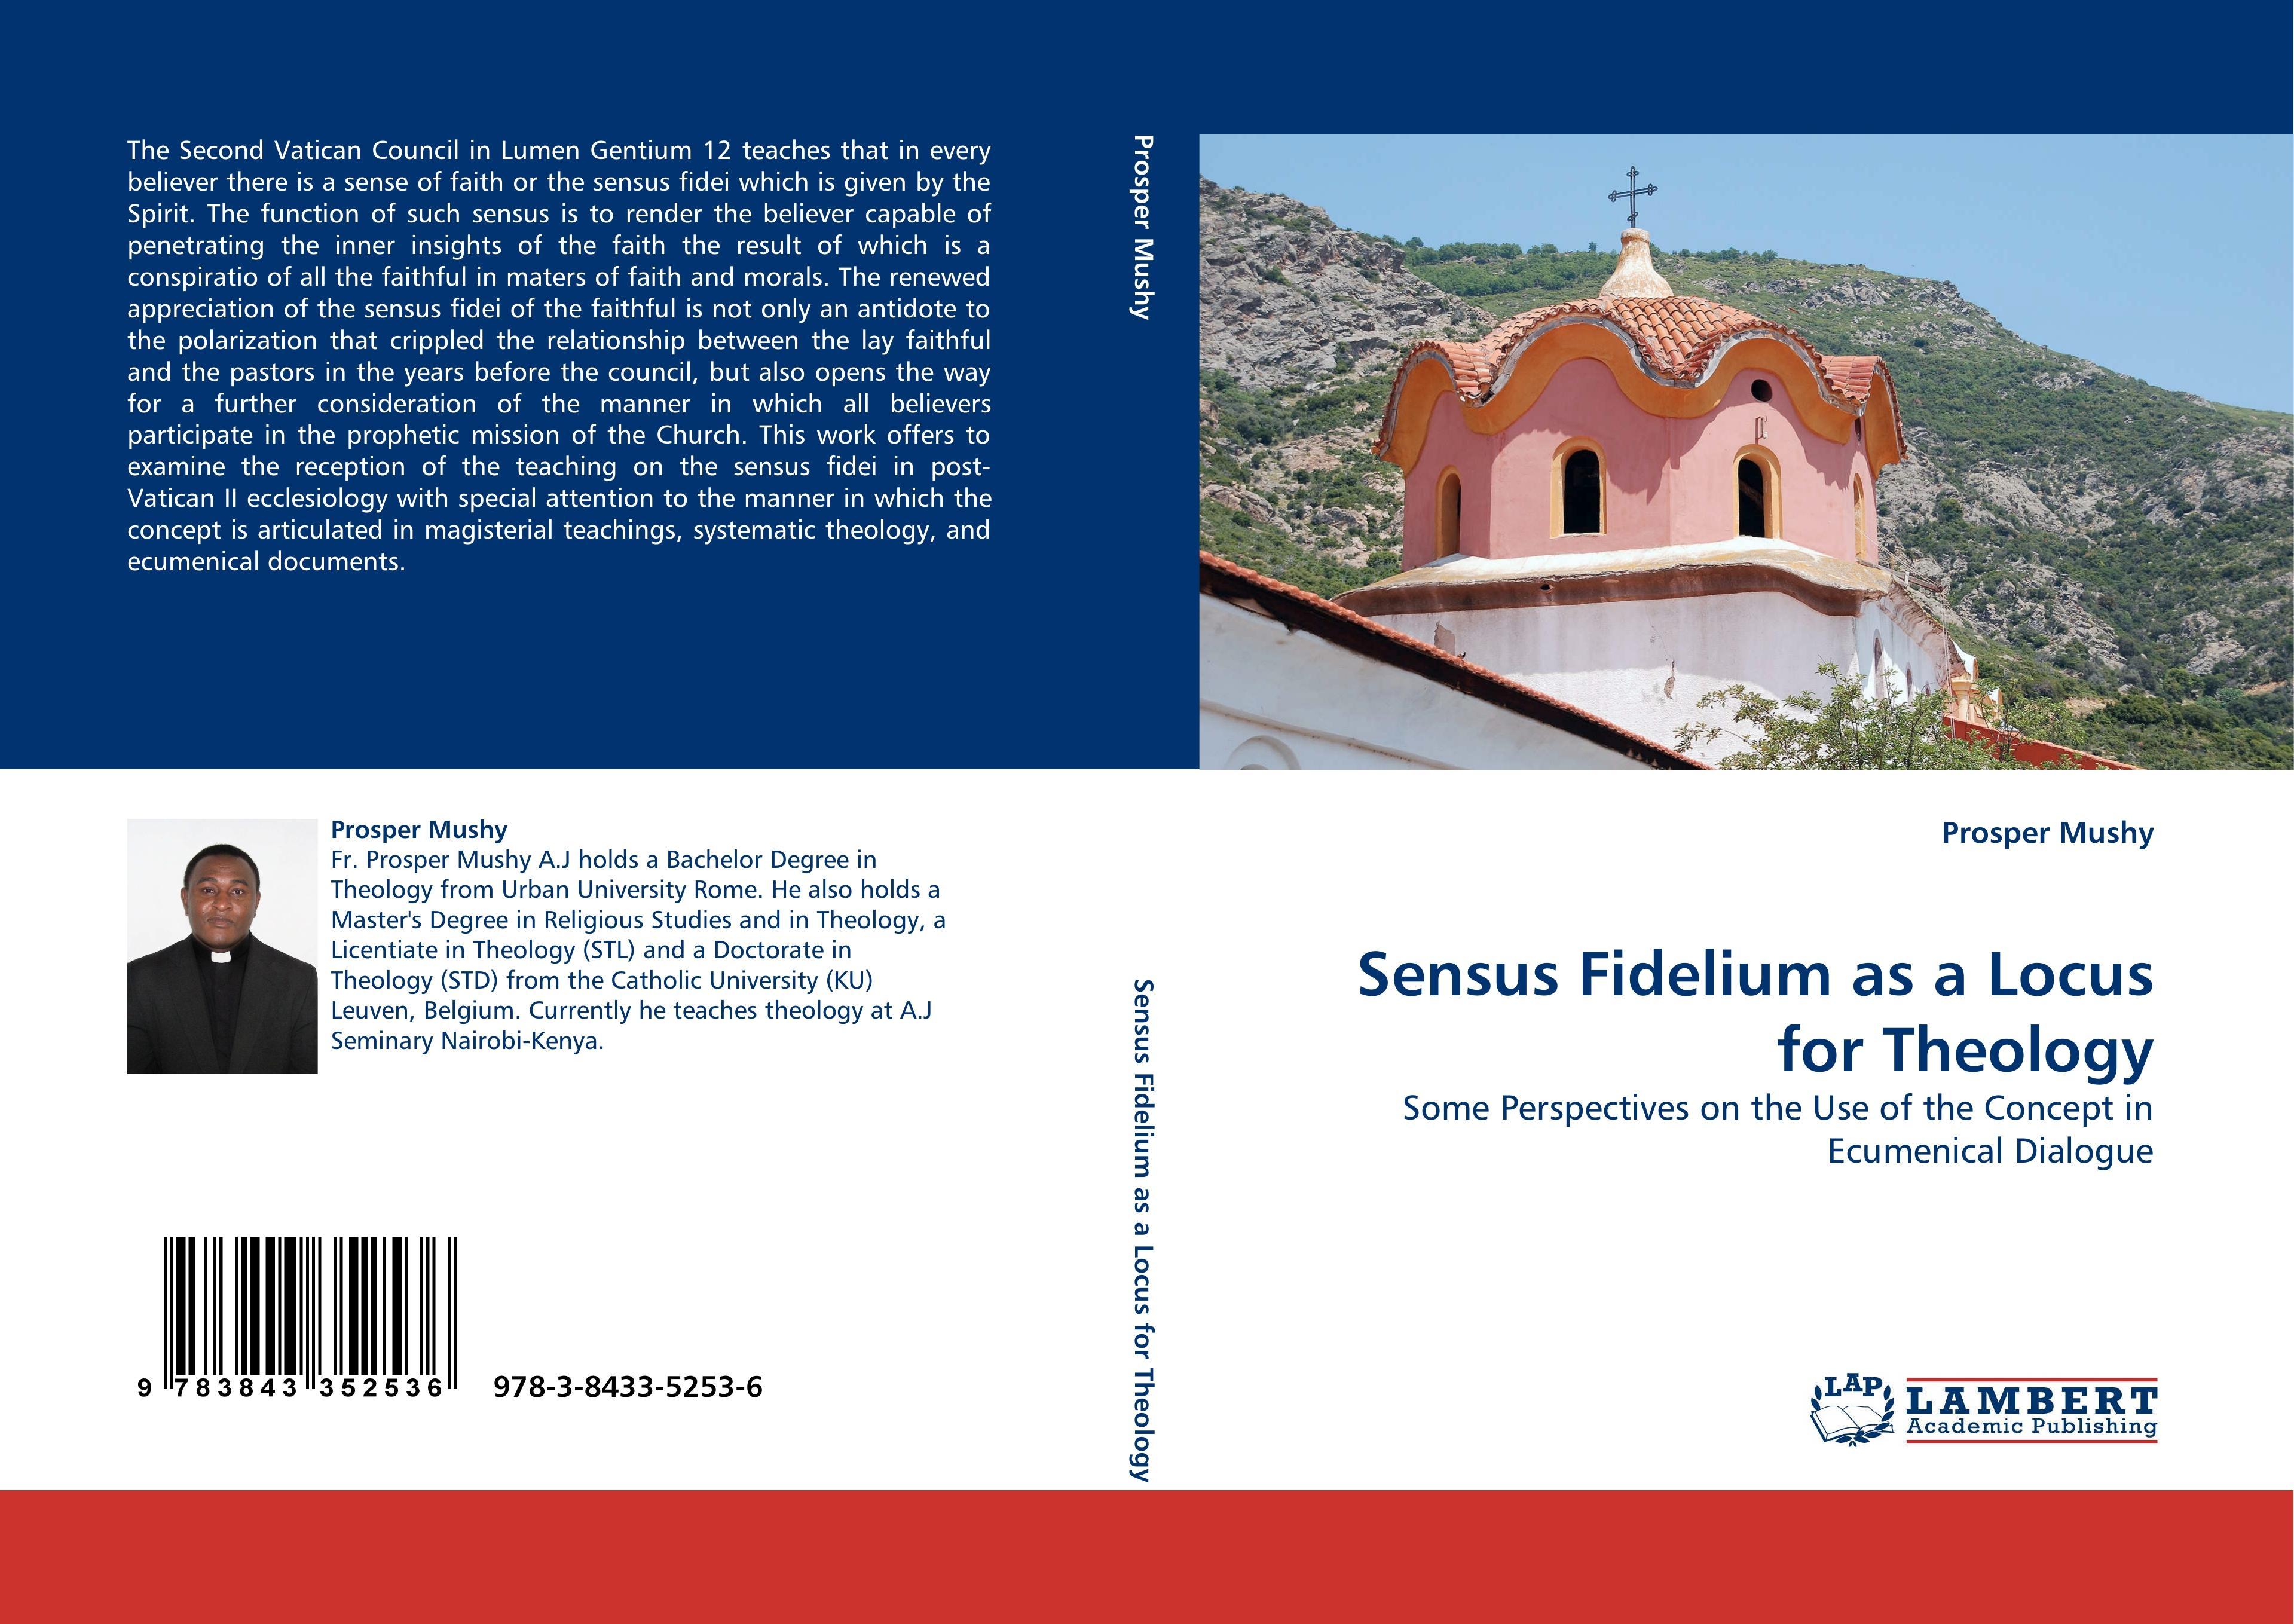 Sensus Fidelium as a Locus for Theology - Mushy, Prosper